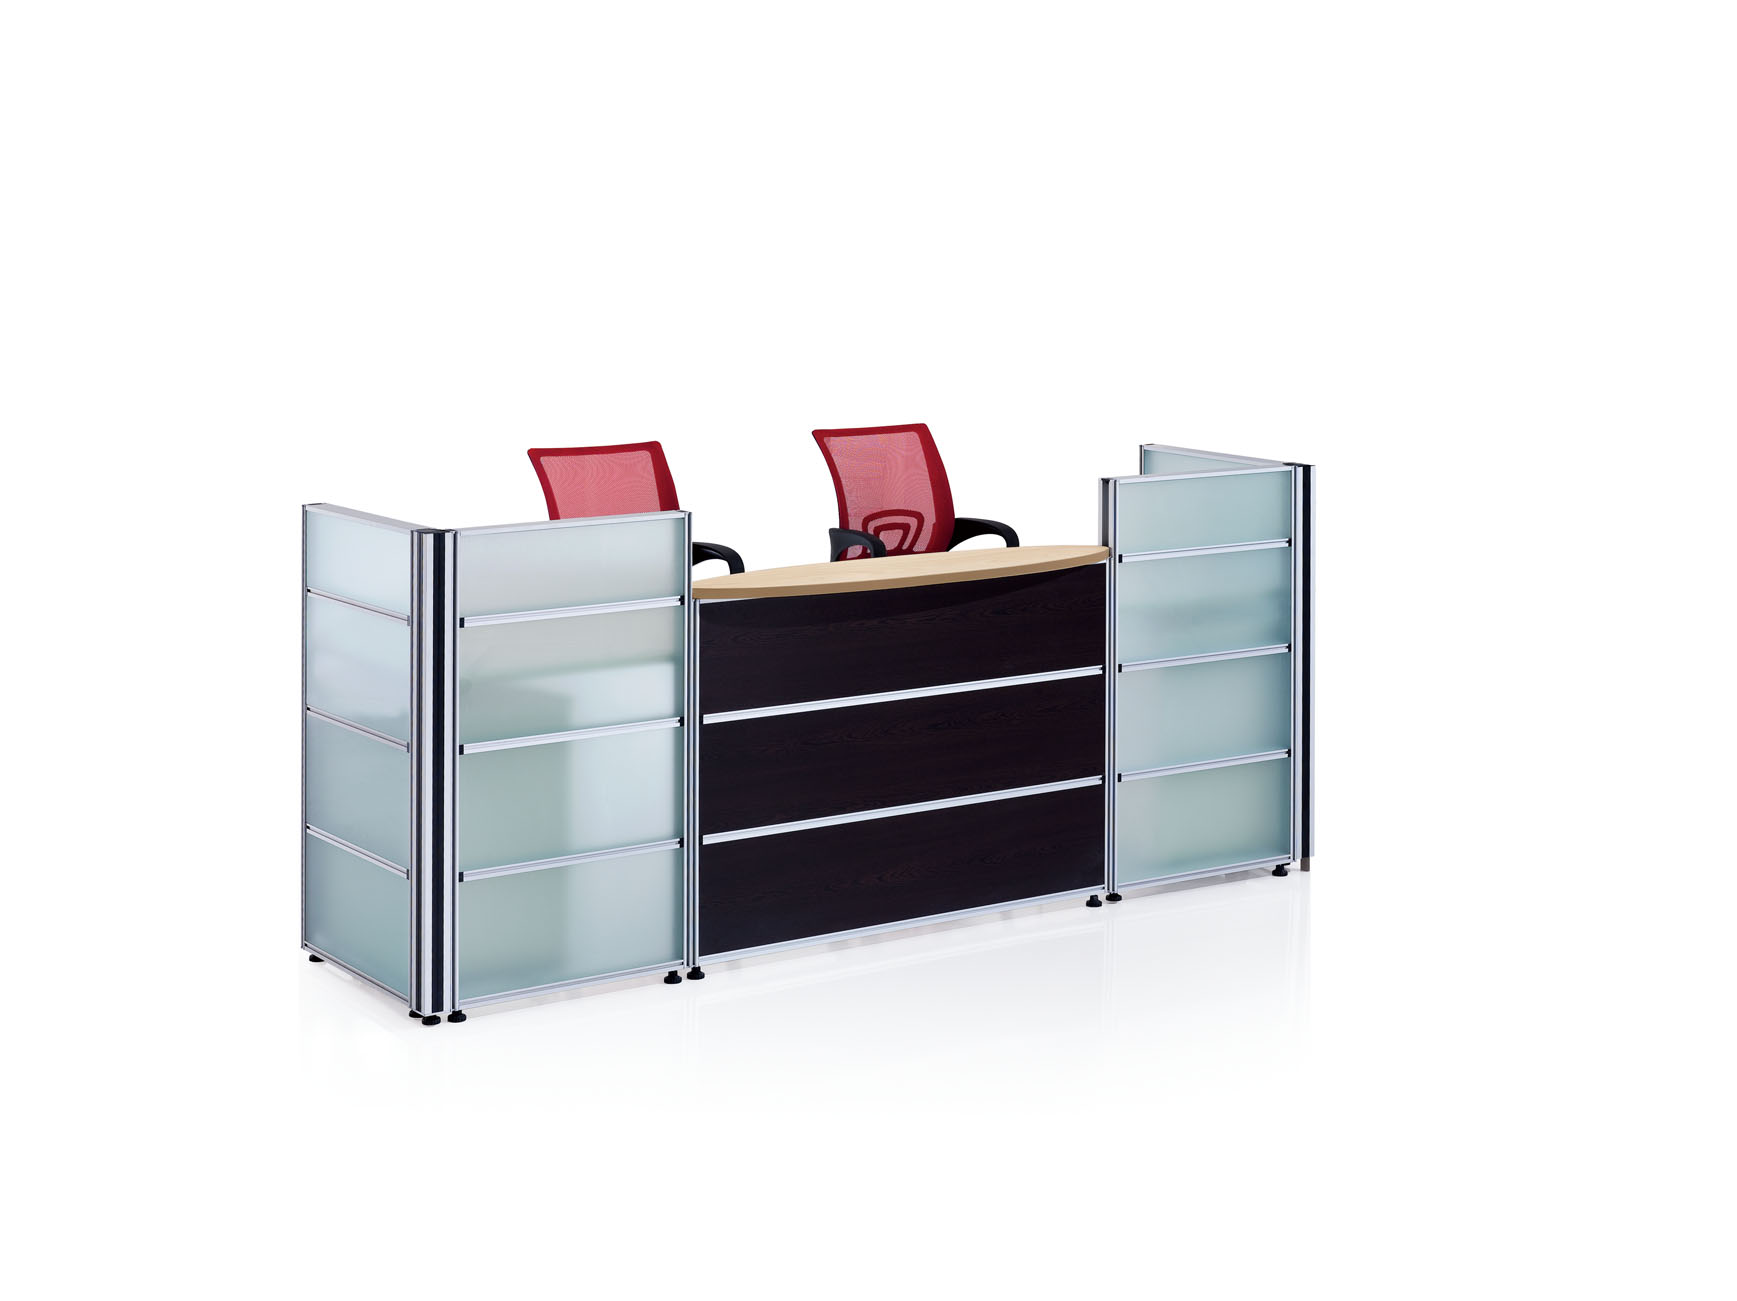 Office Work Stations Furniture Supplier Saudi Arabia